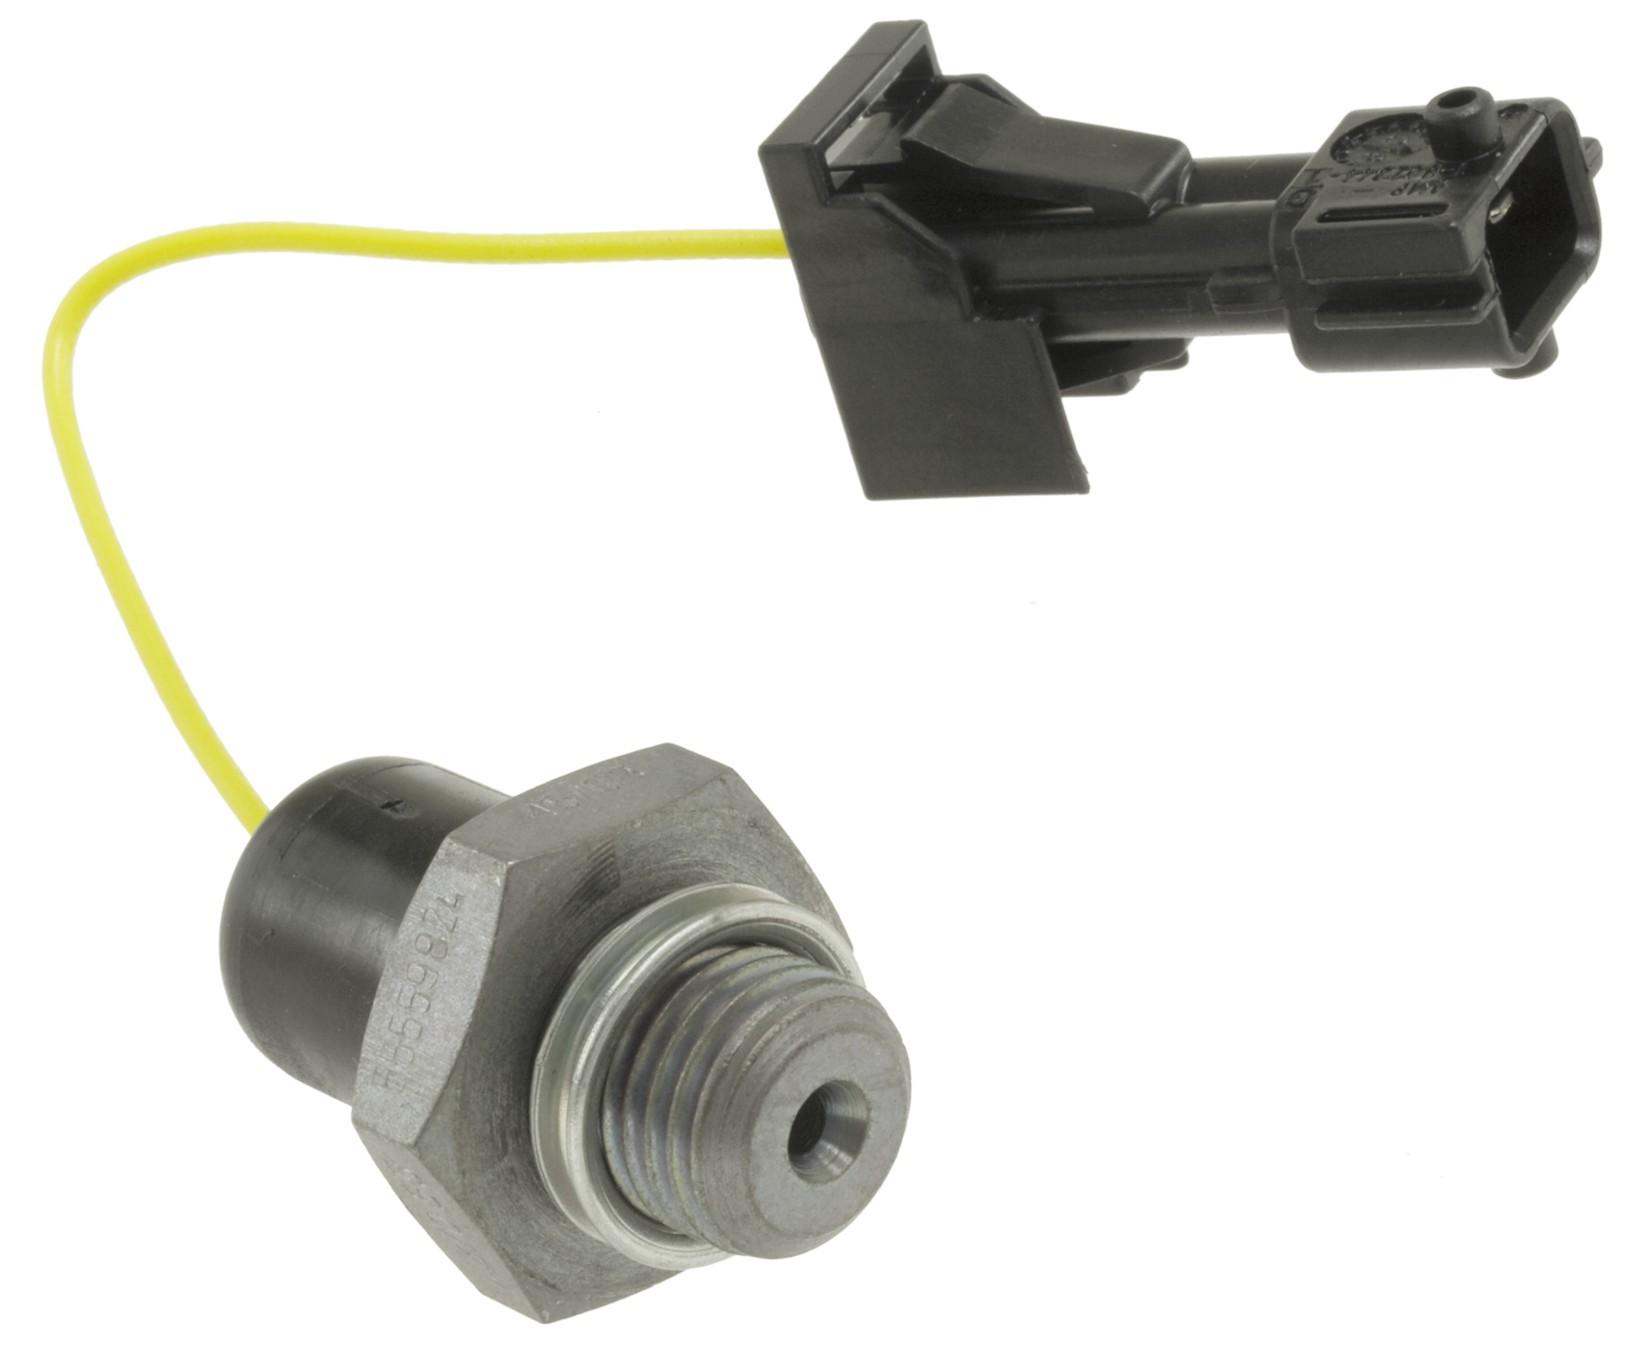 Fuel Pump Location Gm 5 3 Vortec Get Free Image About Wiring Diagram